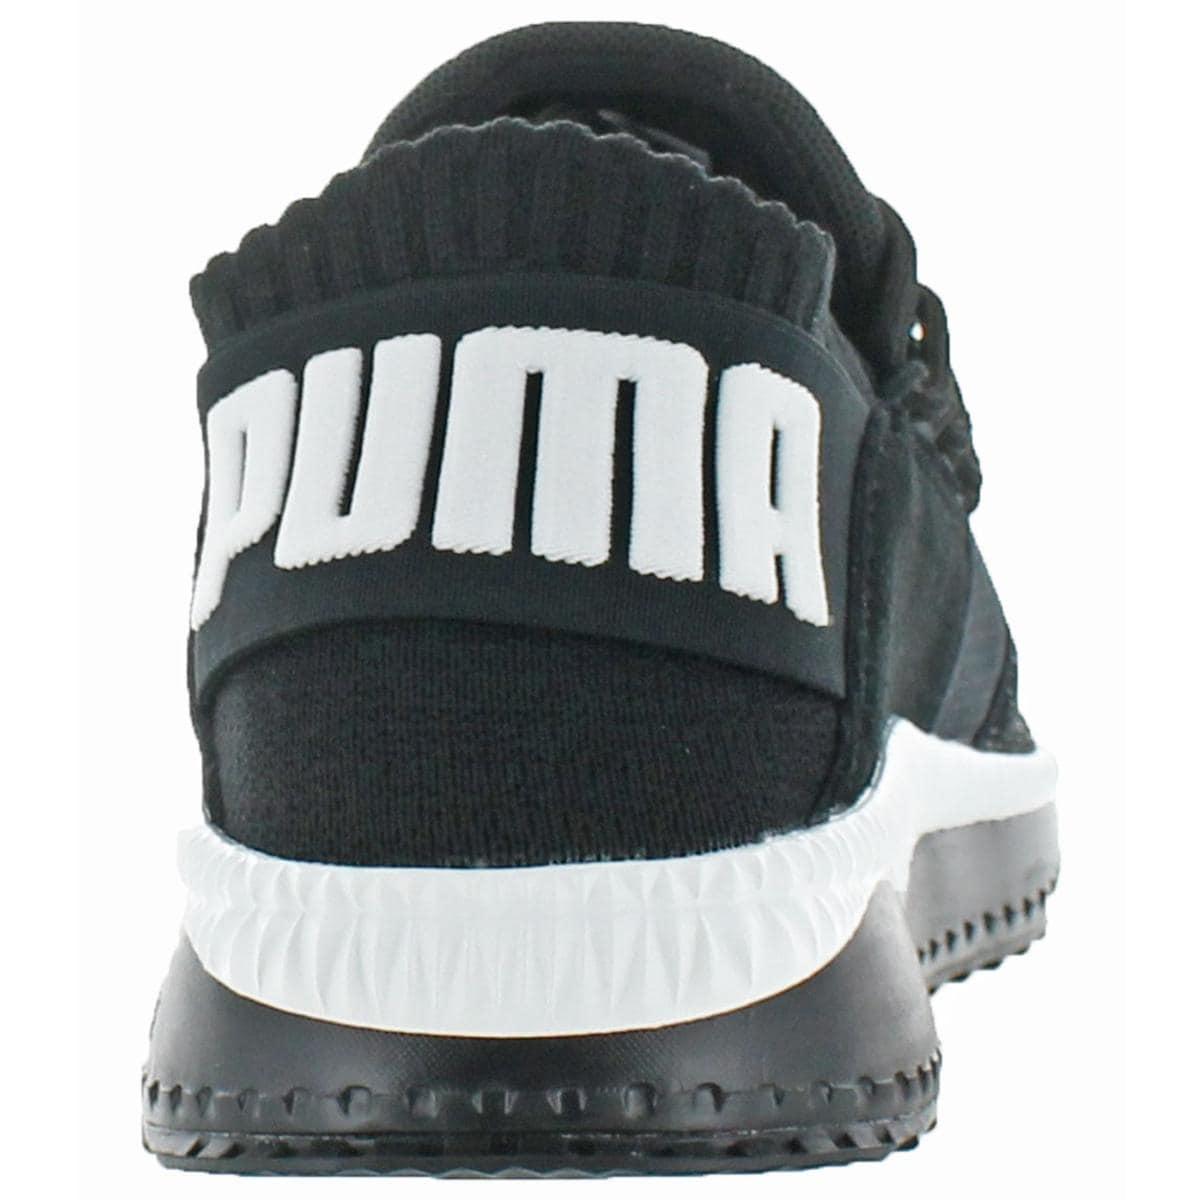 quality design abc5e 7e9ee Shop Puma Mens TSUGI Shinsei Nocturnal Fashion Sneakers Lightweight Casual  - Free Shipping Today - Overstock - 21427800